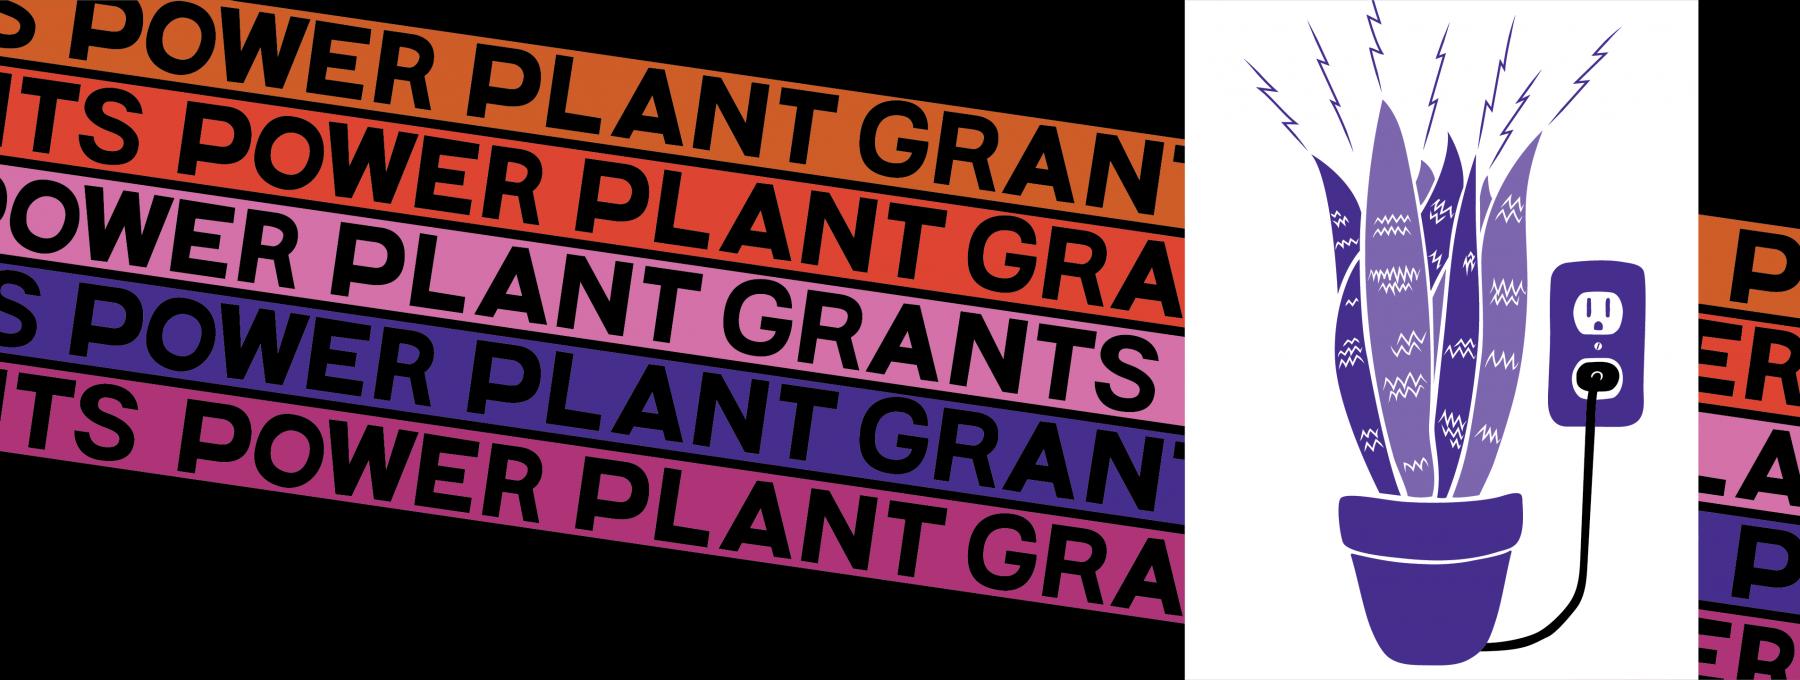 Power Plant Grant